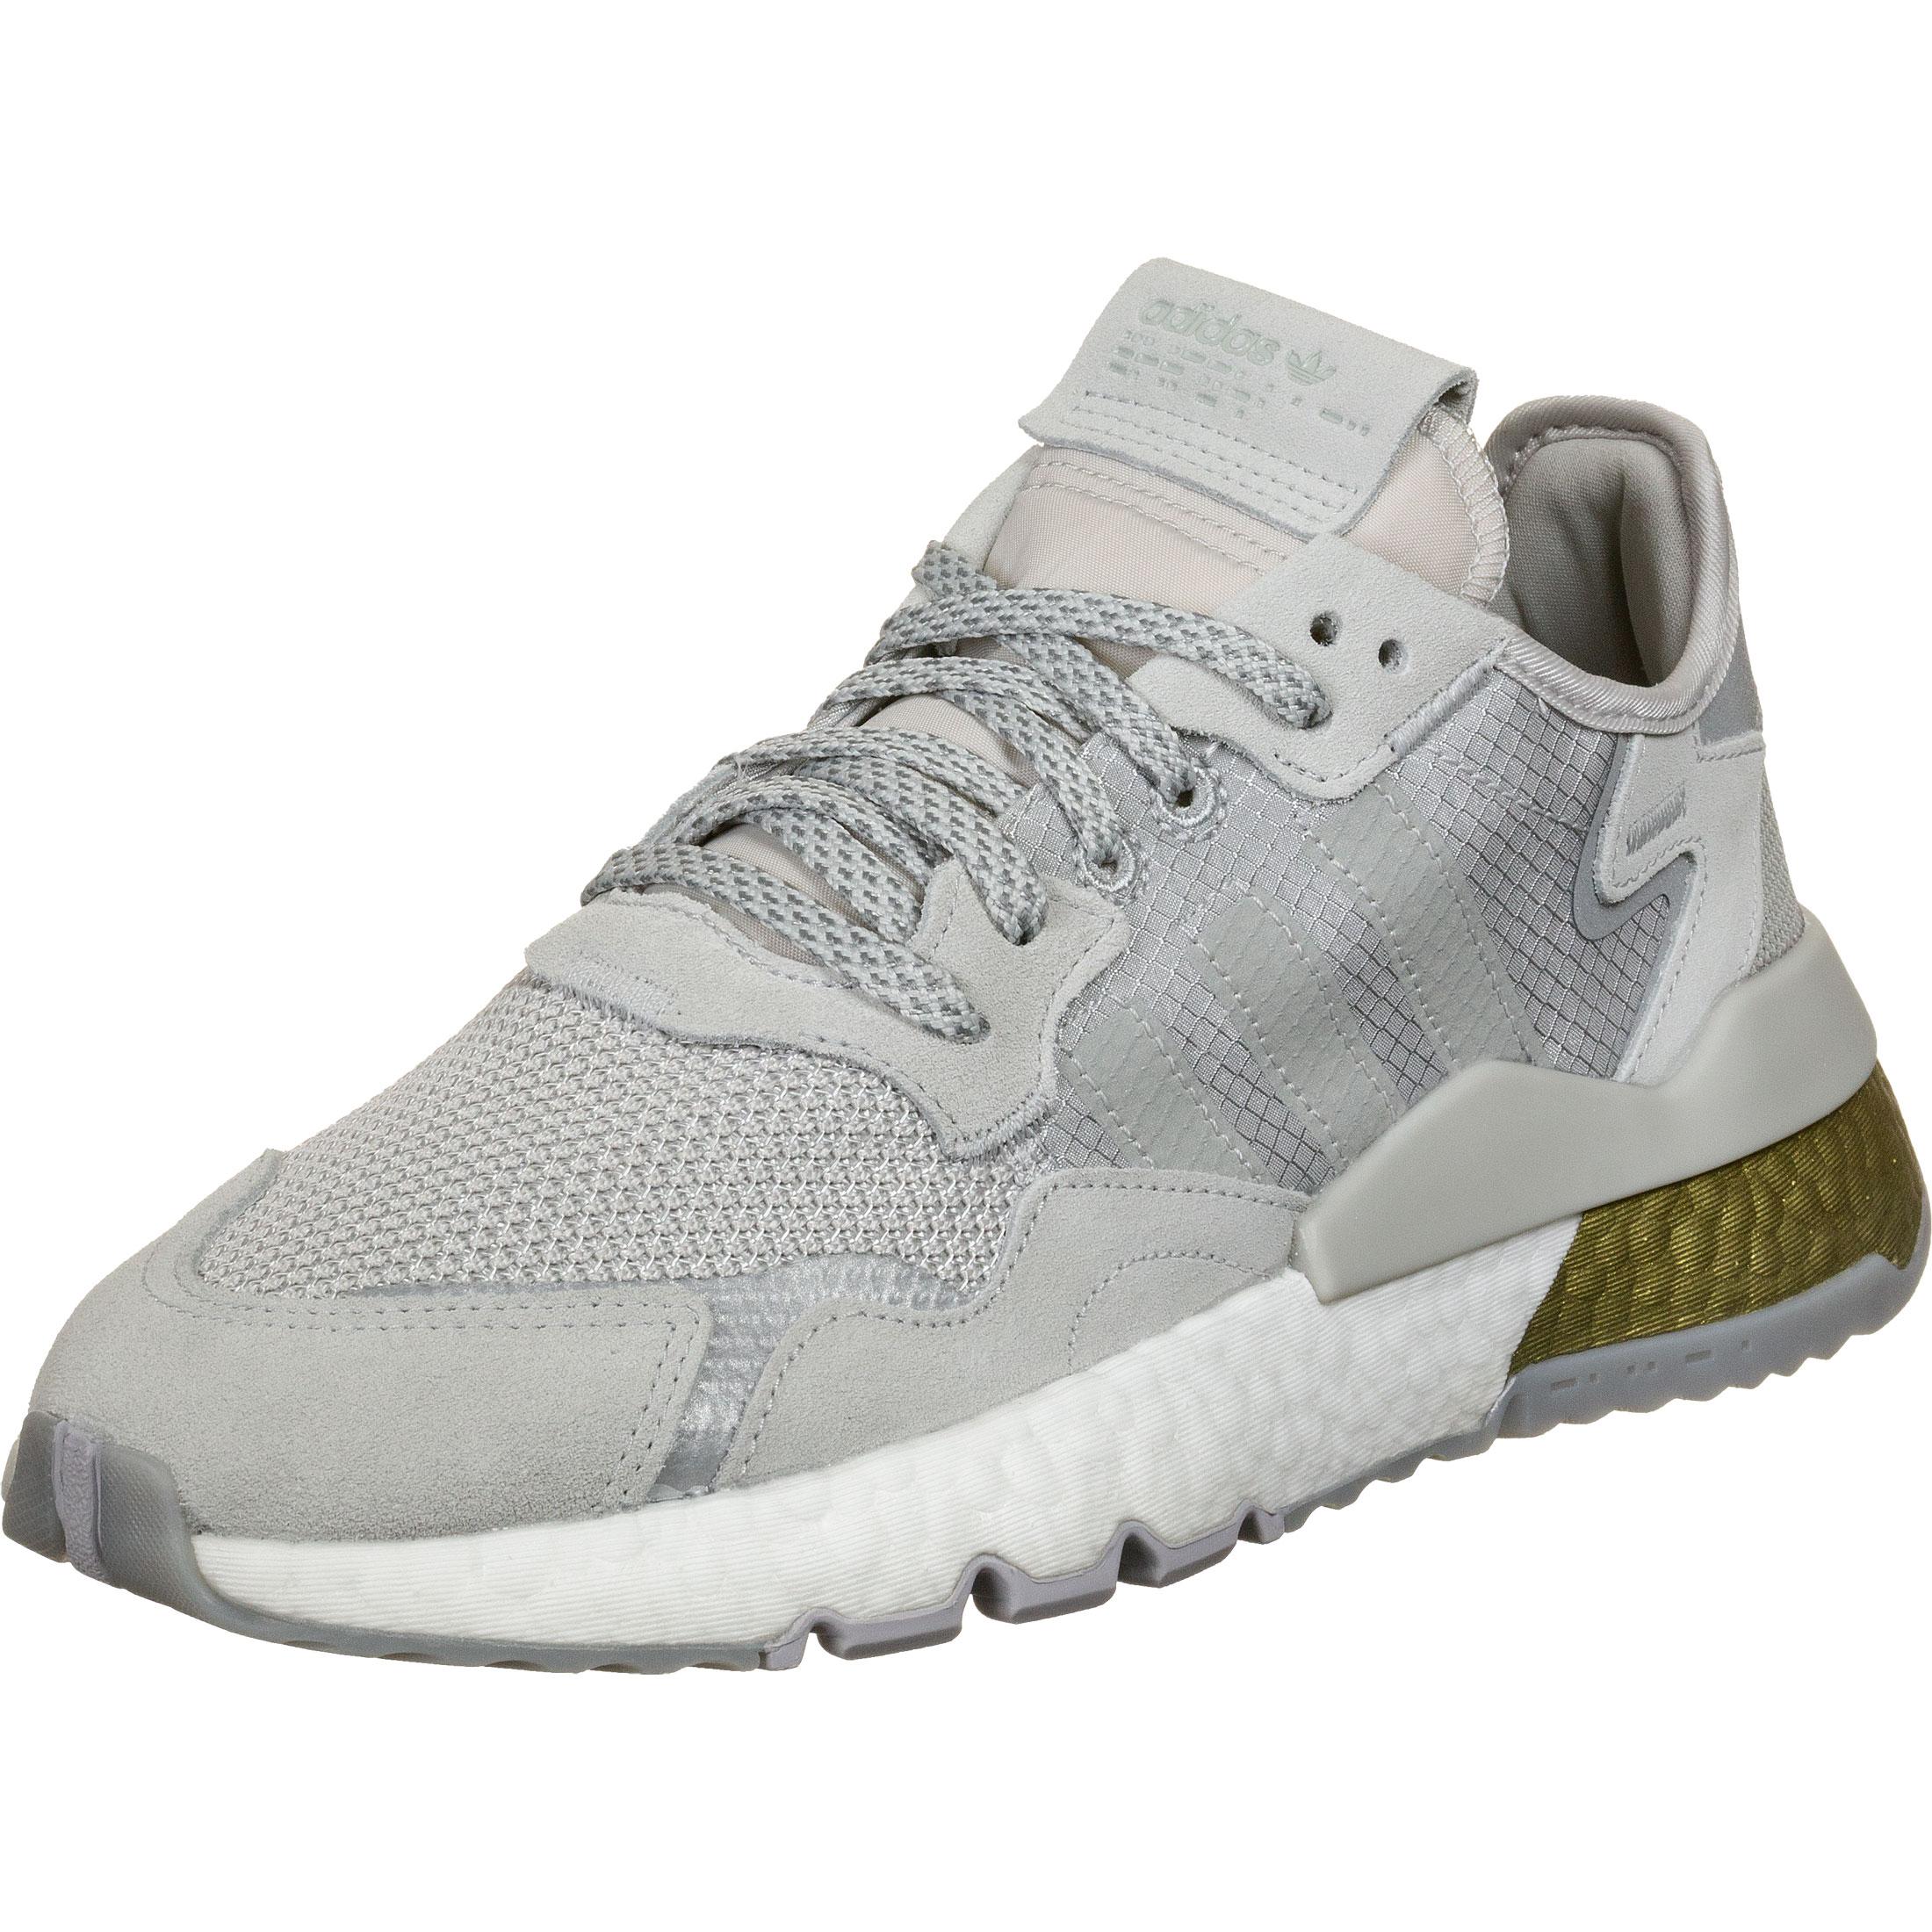 adidas Nite Jogger - Sneakers Low at